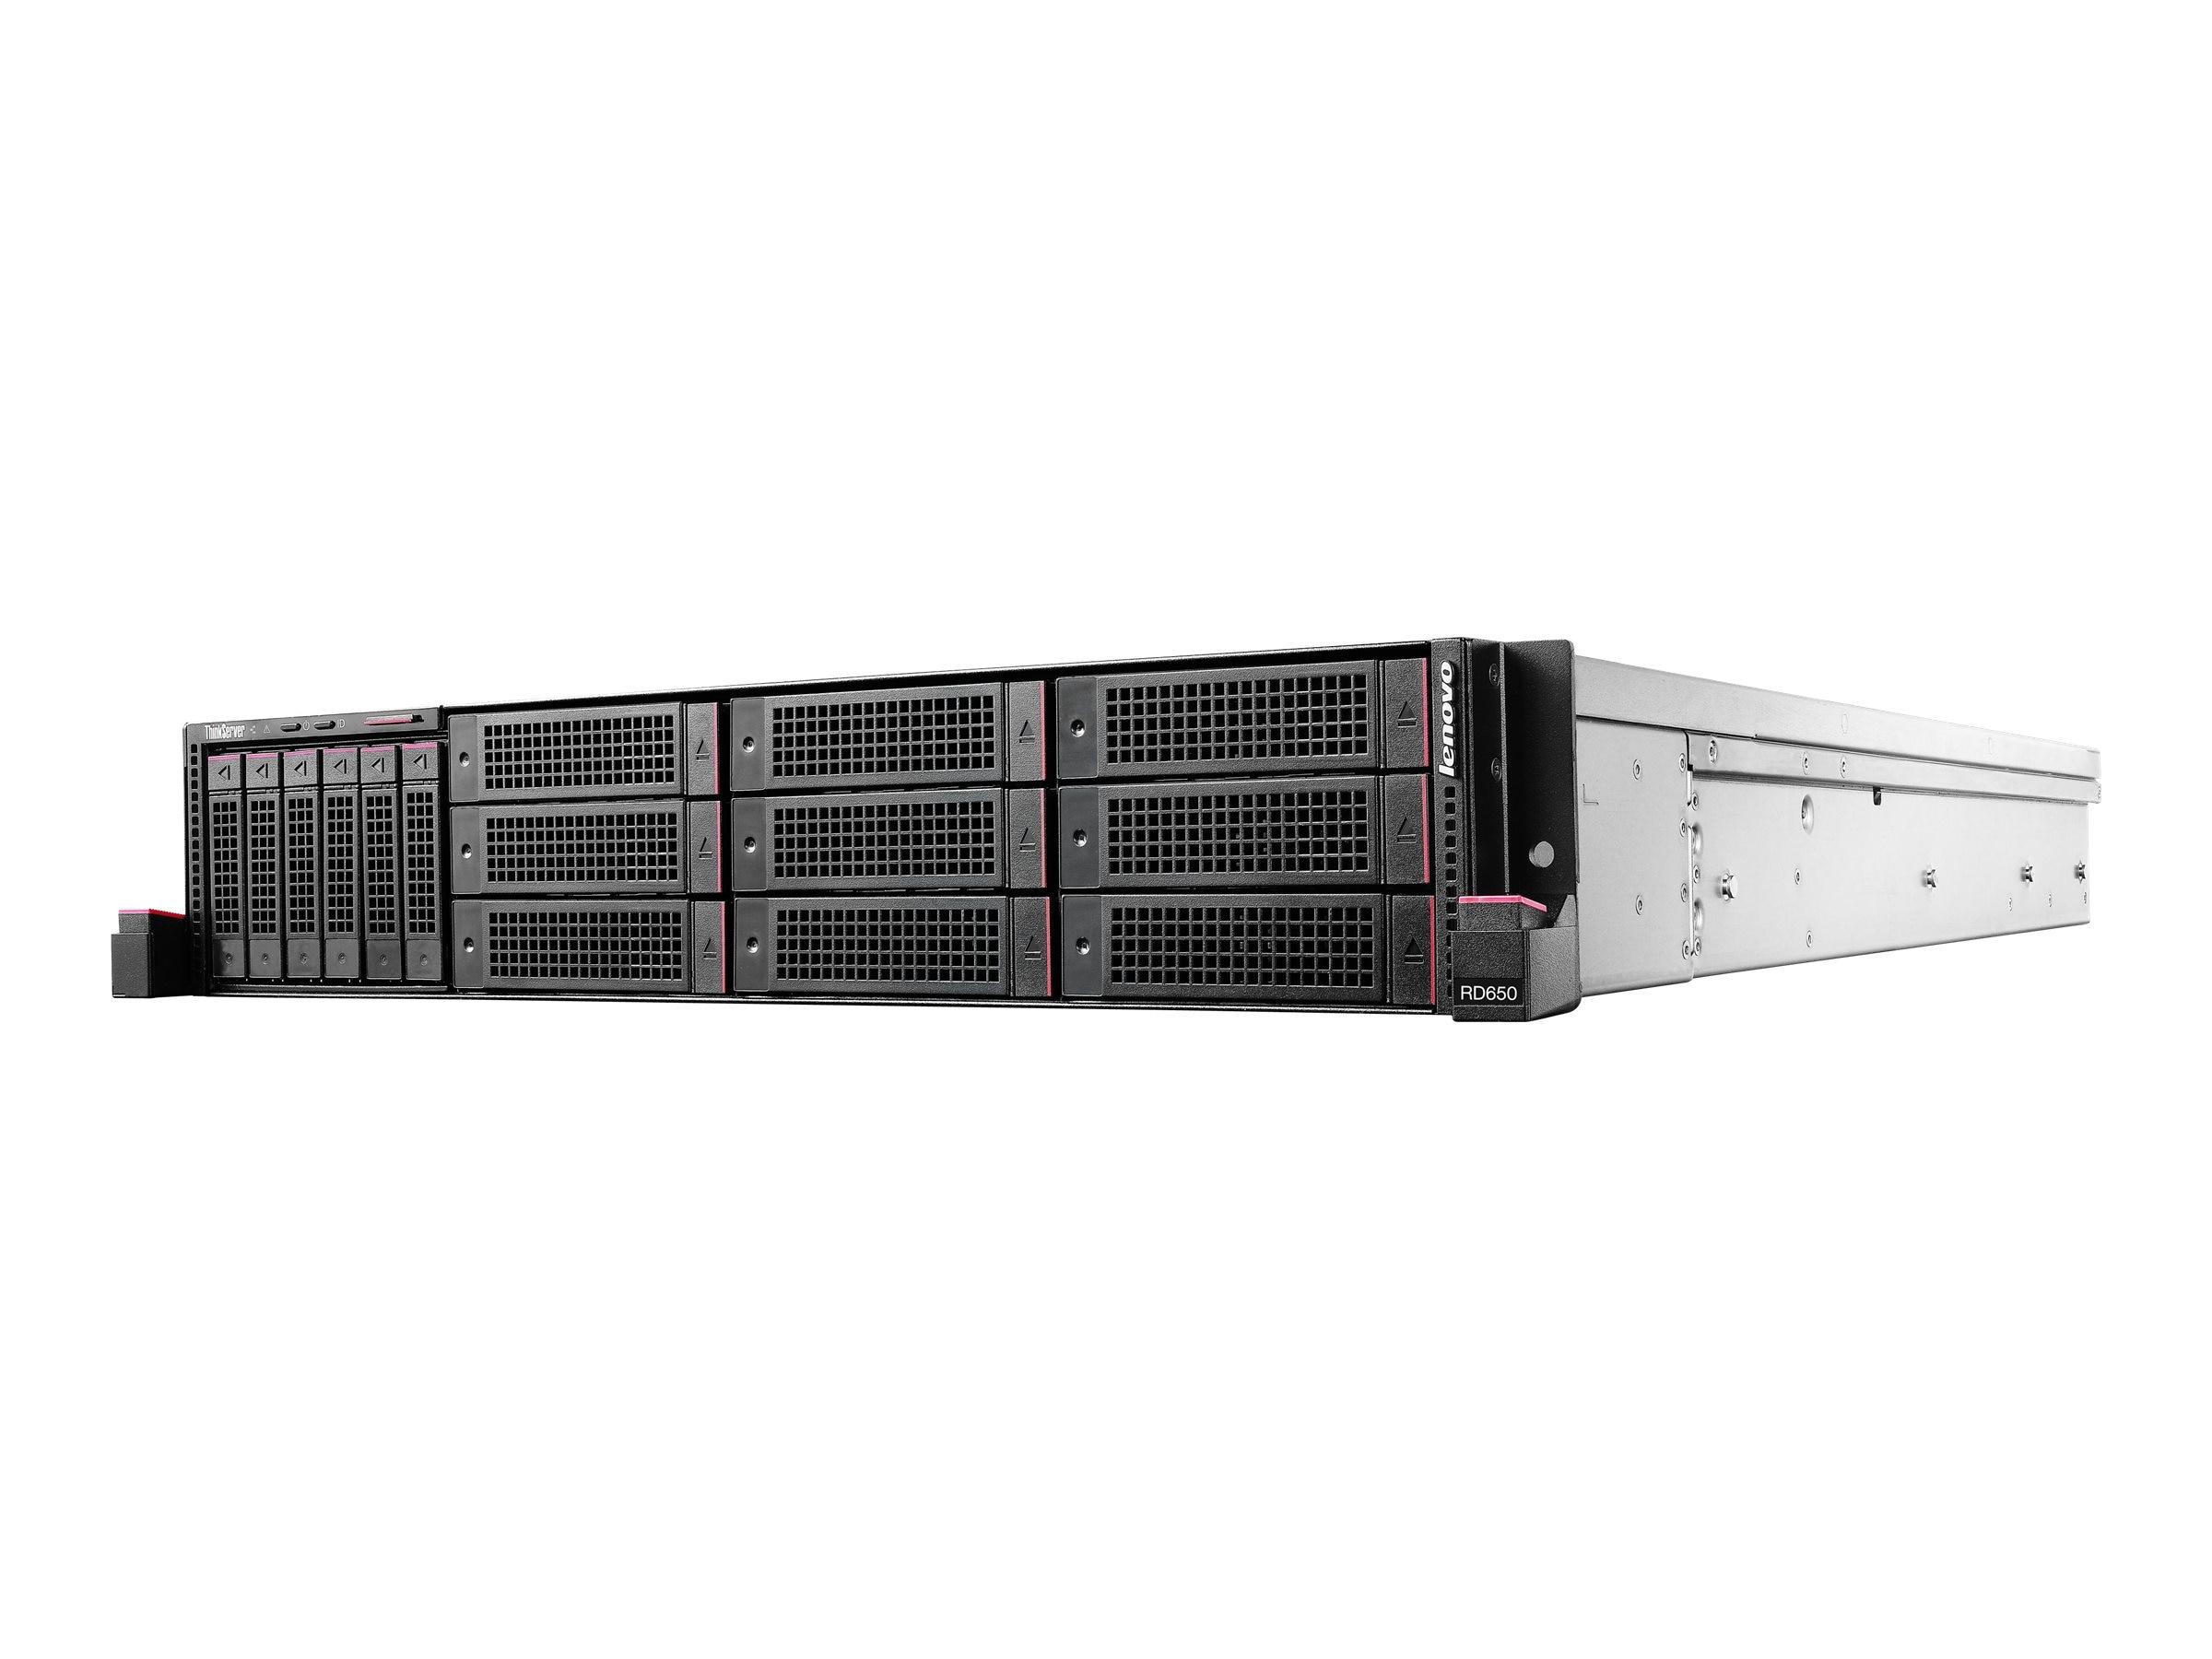 Lenovo TopSeller ThinkServer RD650 2U RM (2x)Xeon 12C E5-2690 v3 2.6GHz 128GB 2x120GB SSD 720ix 2x750W